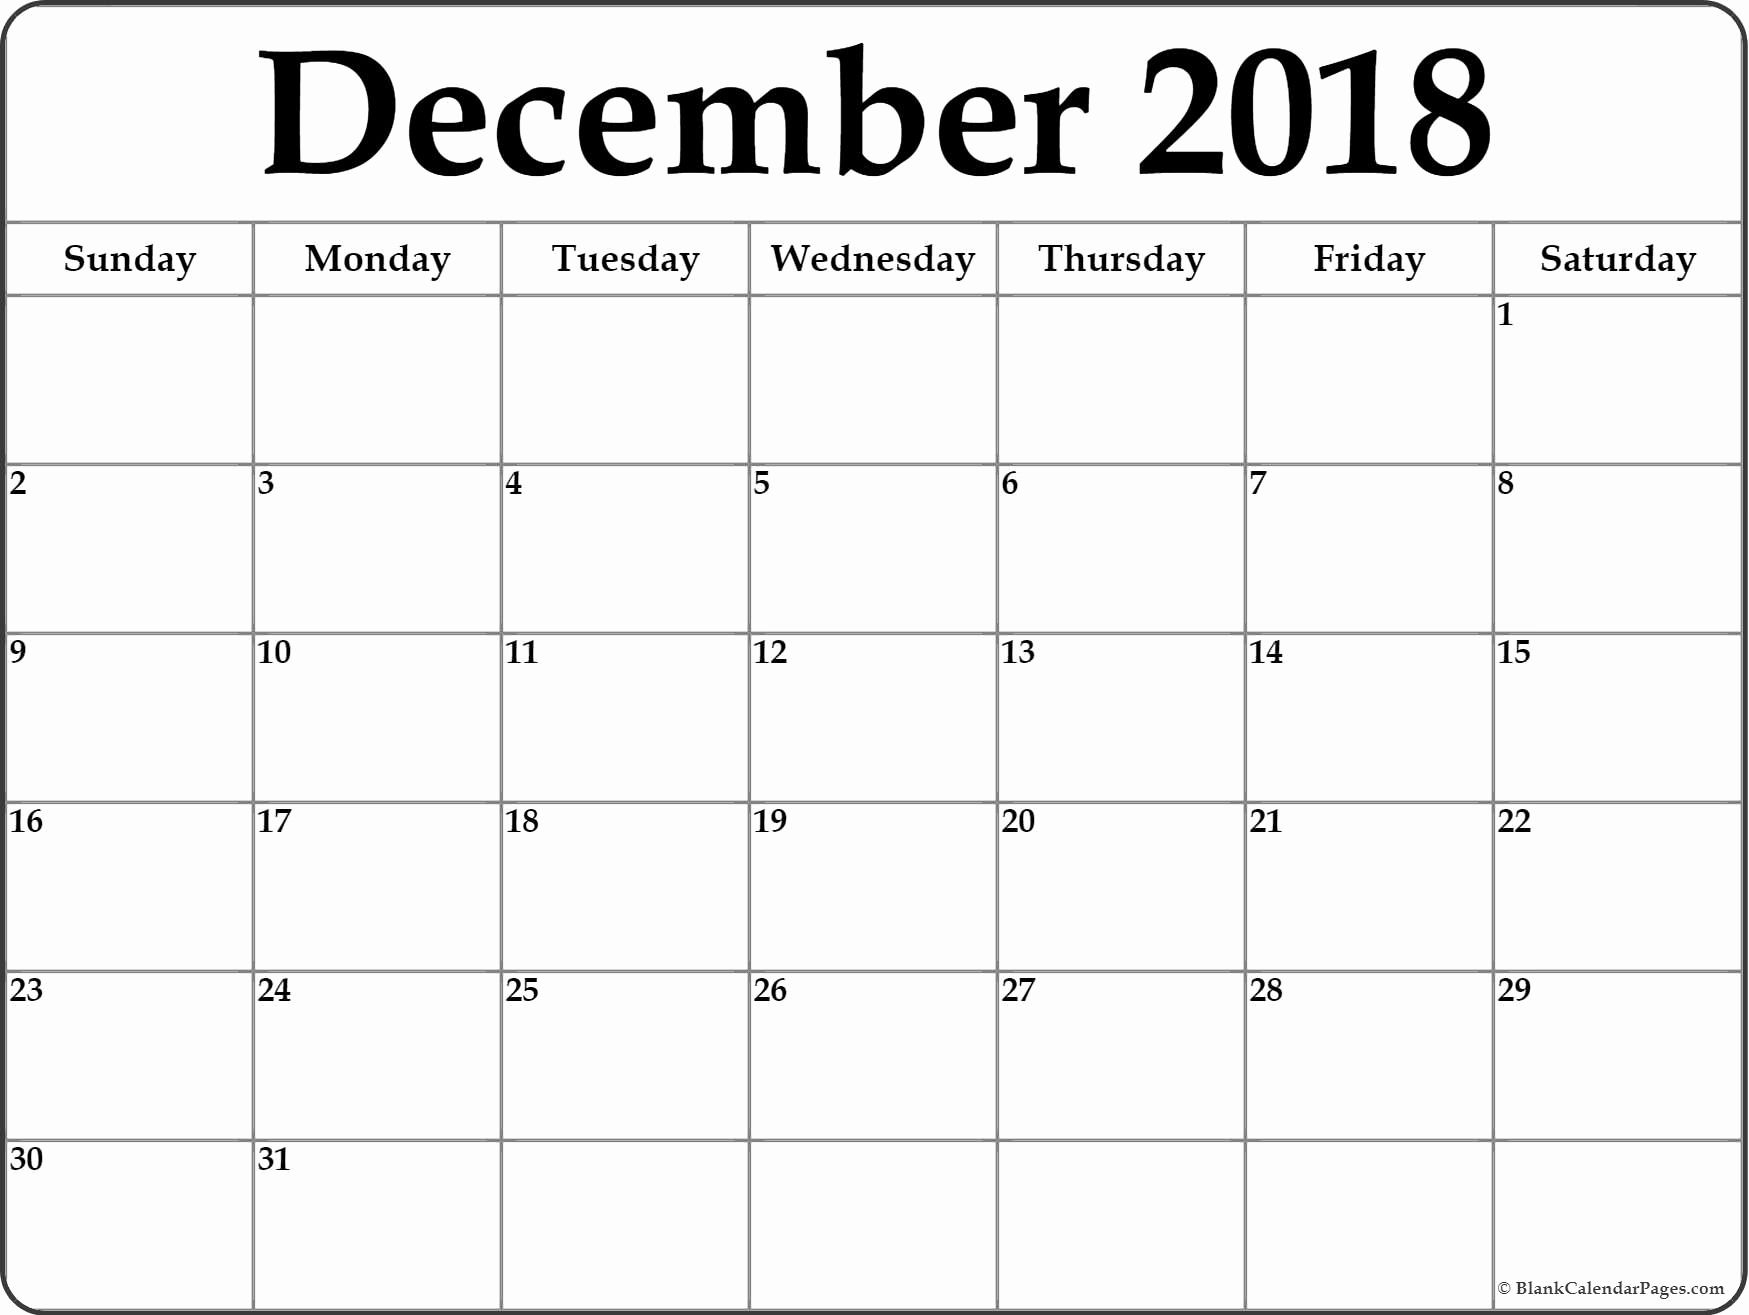 Calendar December 2018 And January 2019 December 2018 Calendar